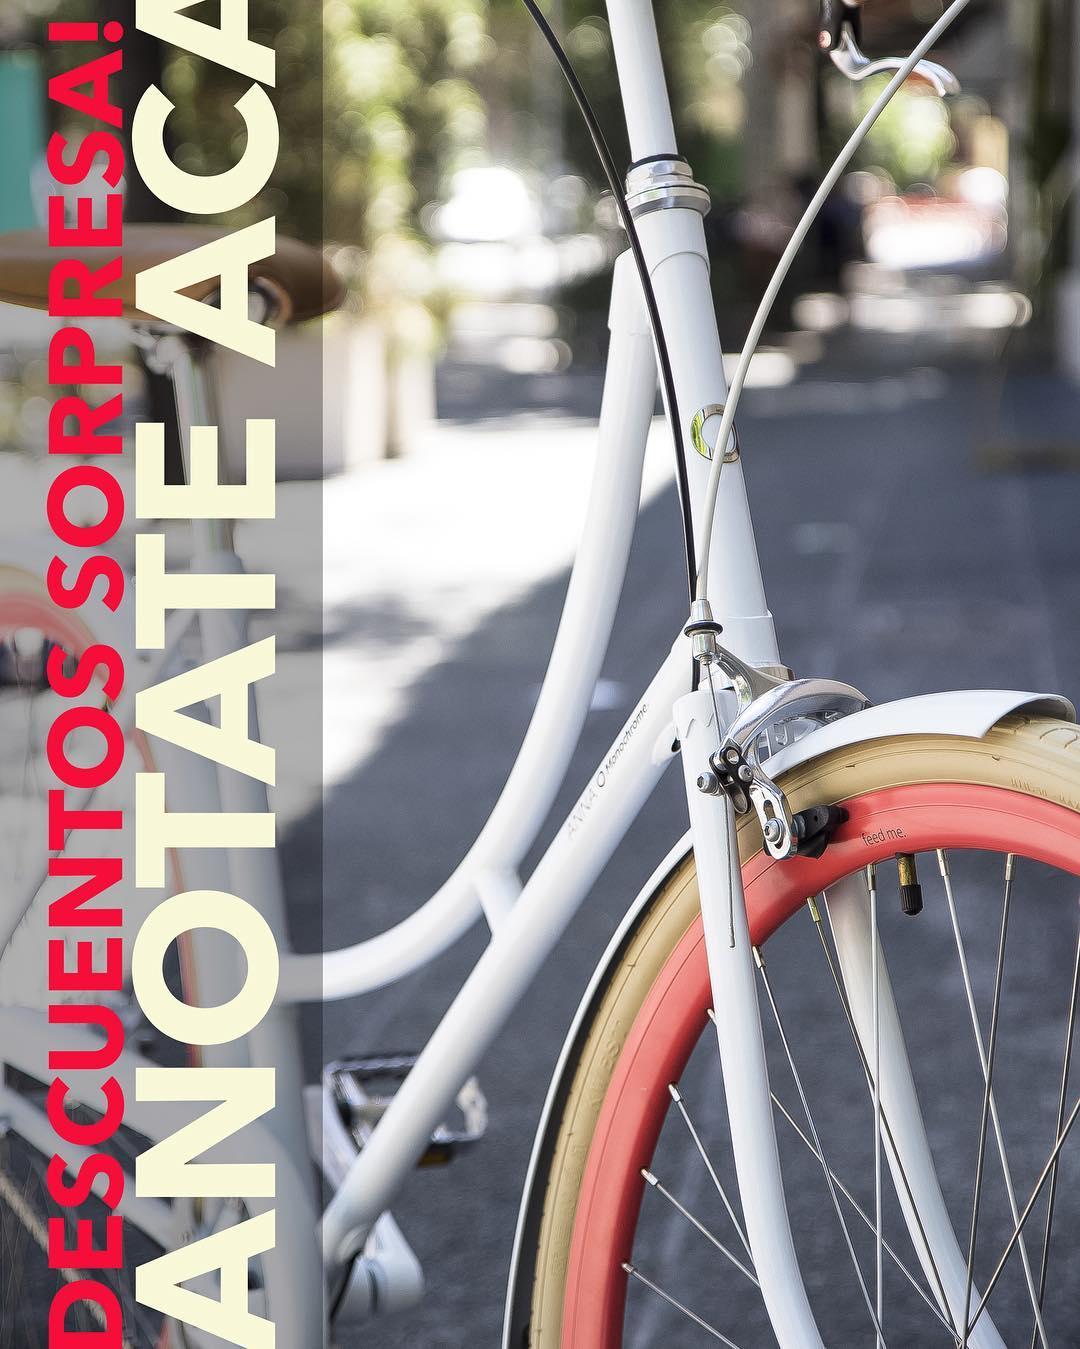 Queres recibir descuentos sorpresa y novedades? Anotate aca! http://www.monochromebikes.com/formas-de-pago/  #monochromebikes